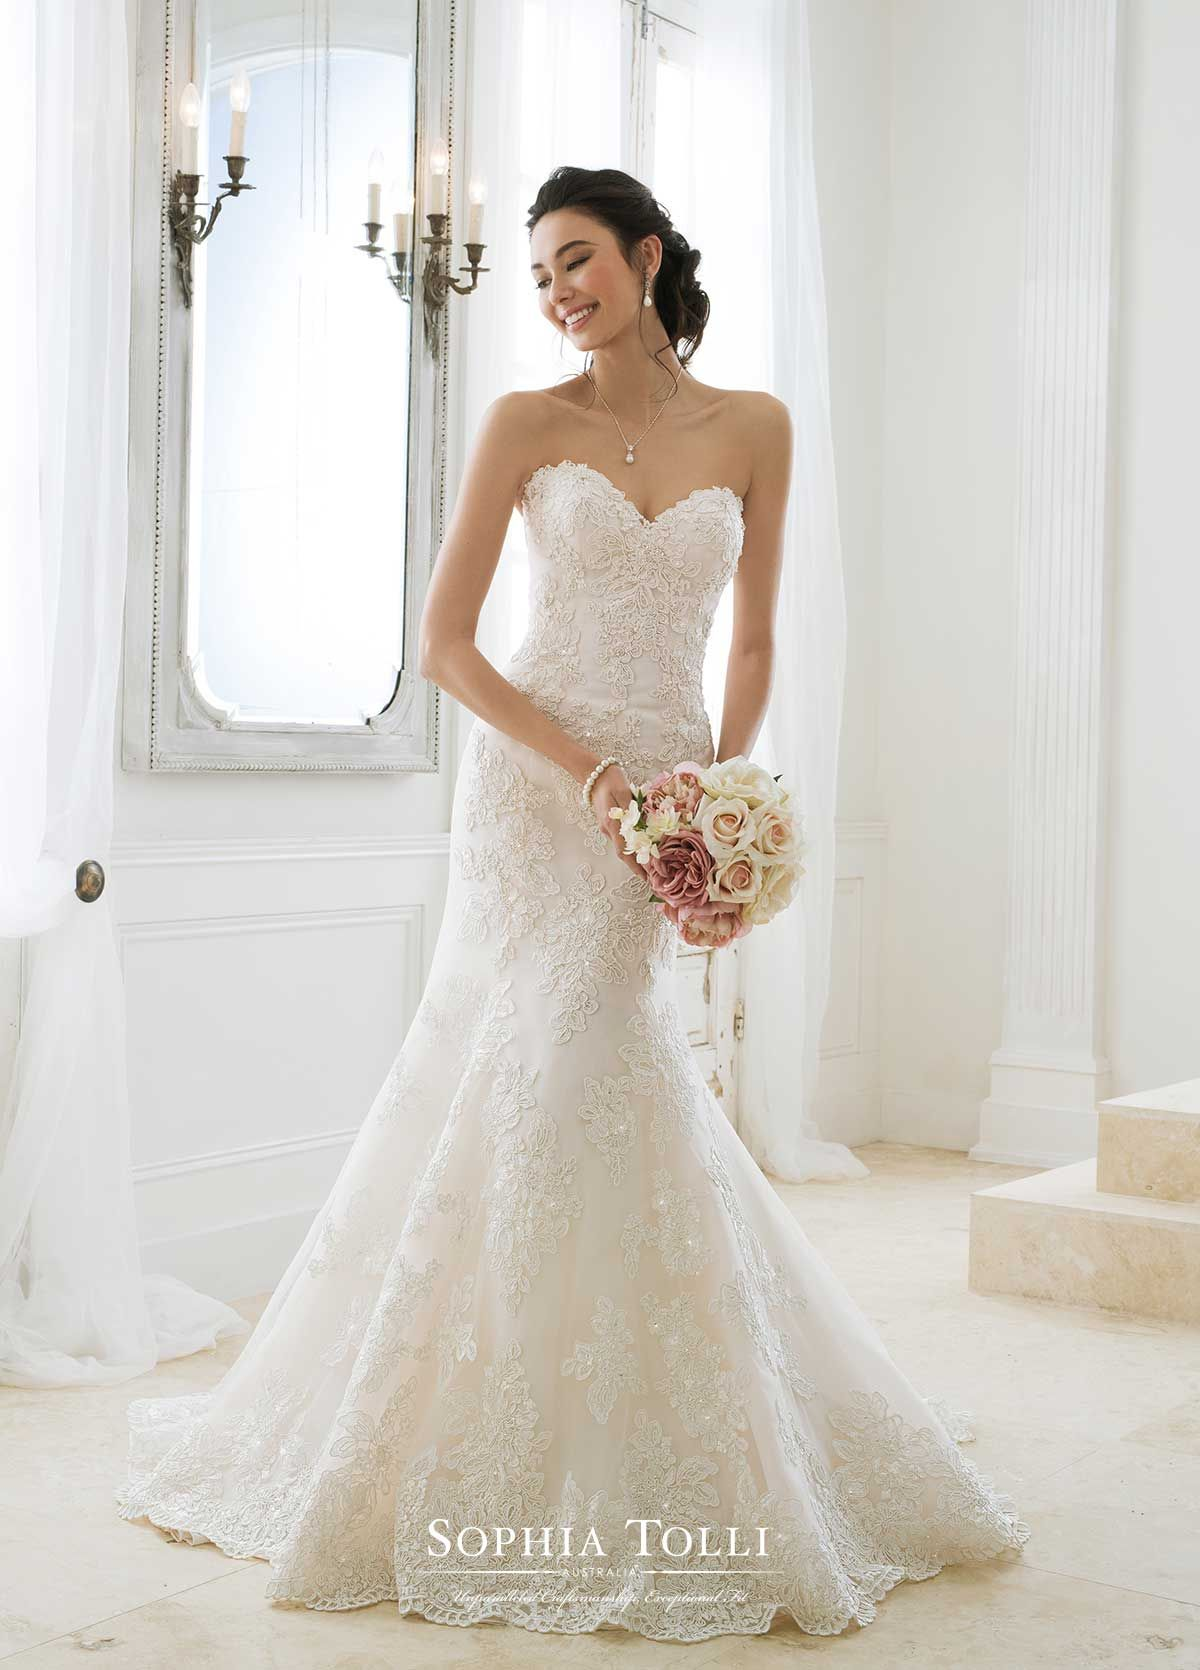 Corset for under wedding dress  Sophia Tolli Y  Sophia Tolli  wedding  Pinterest  Wedding